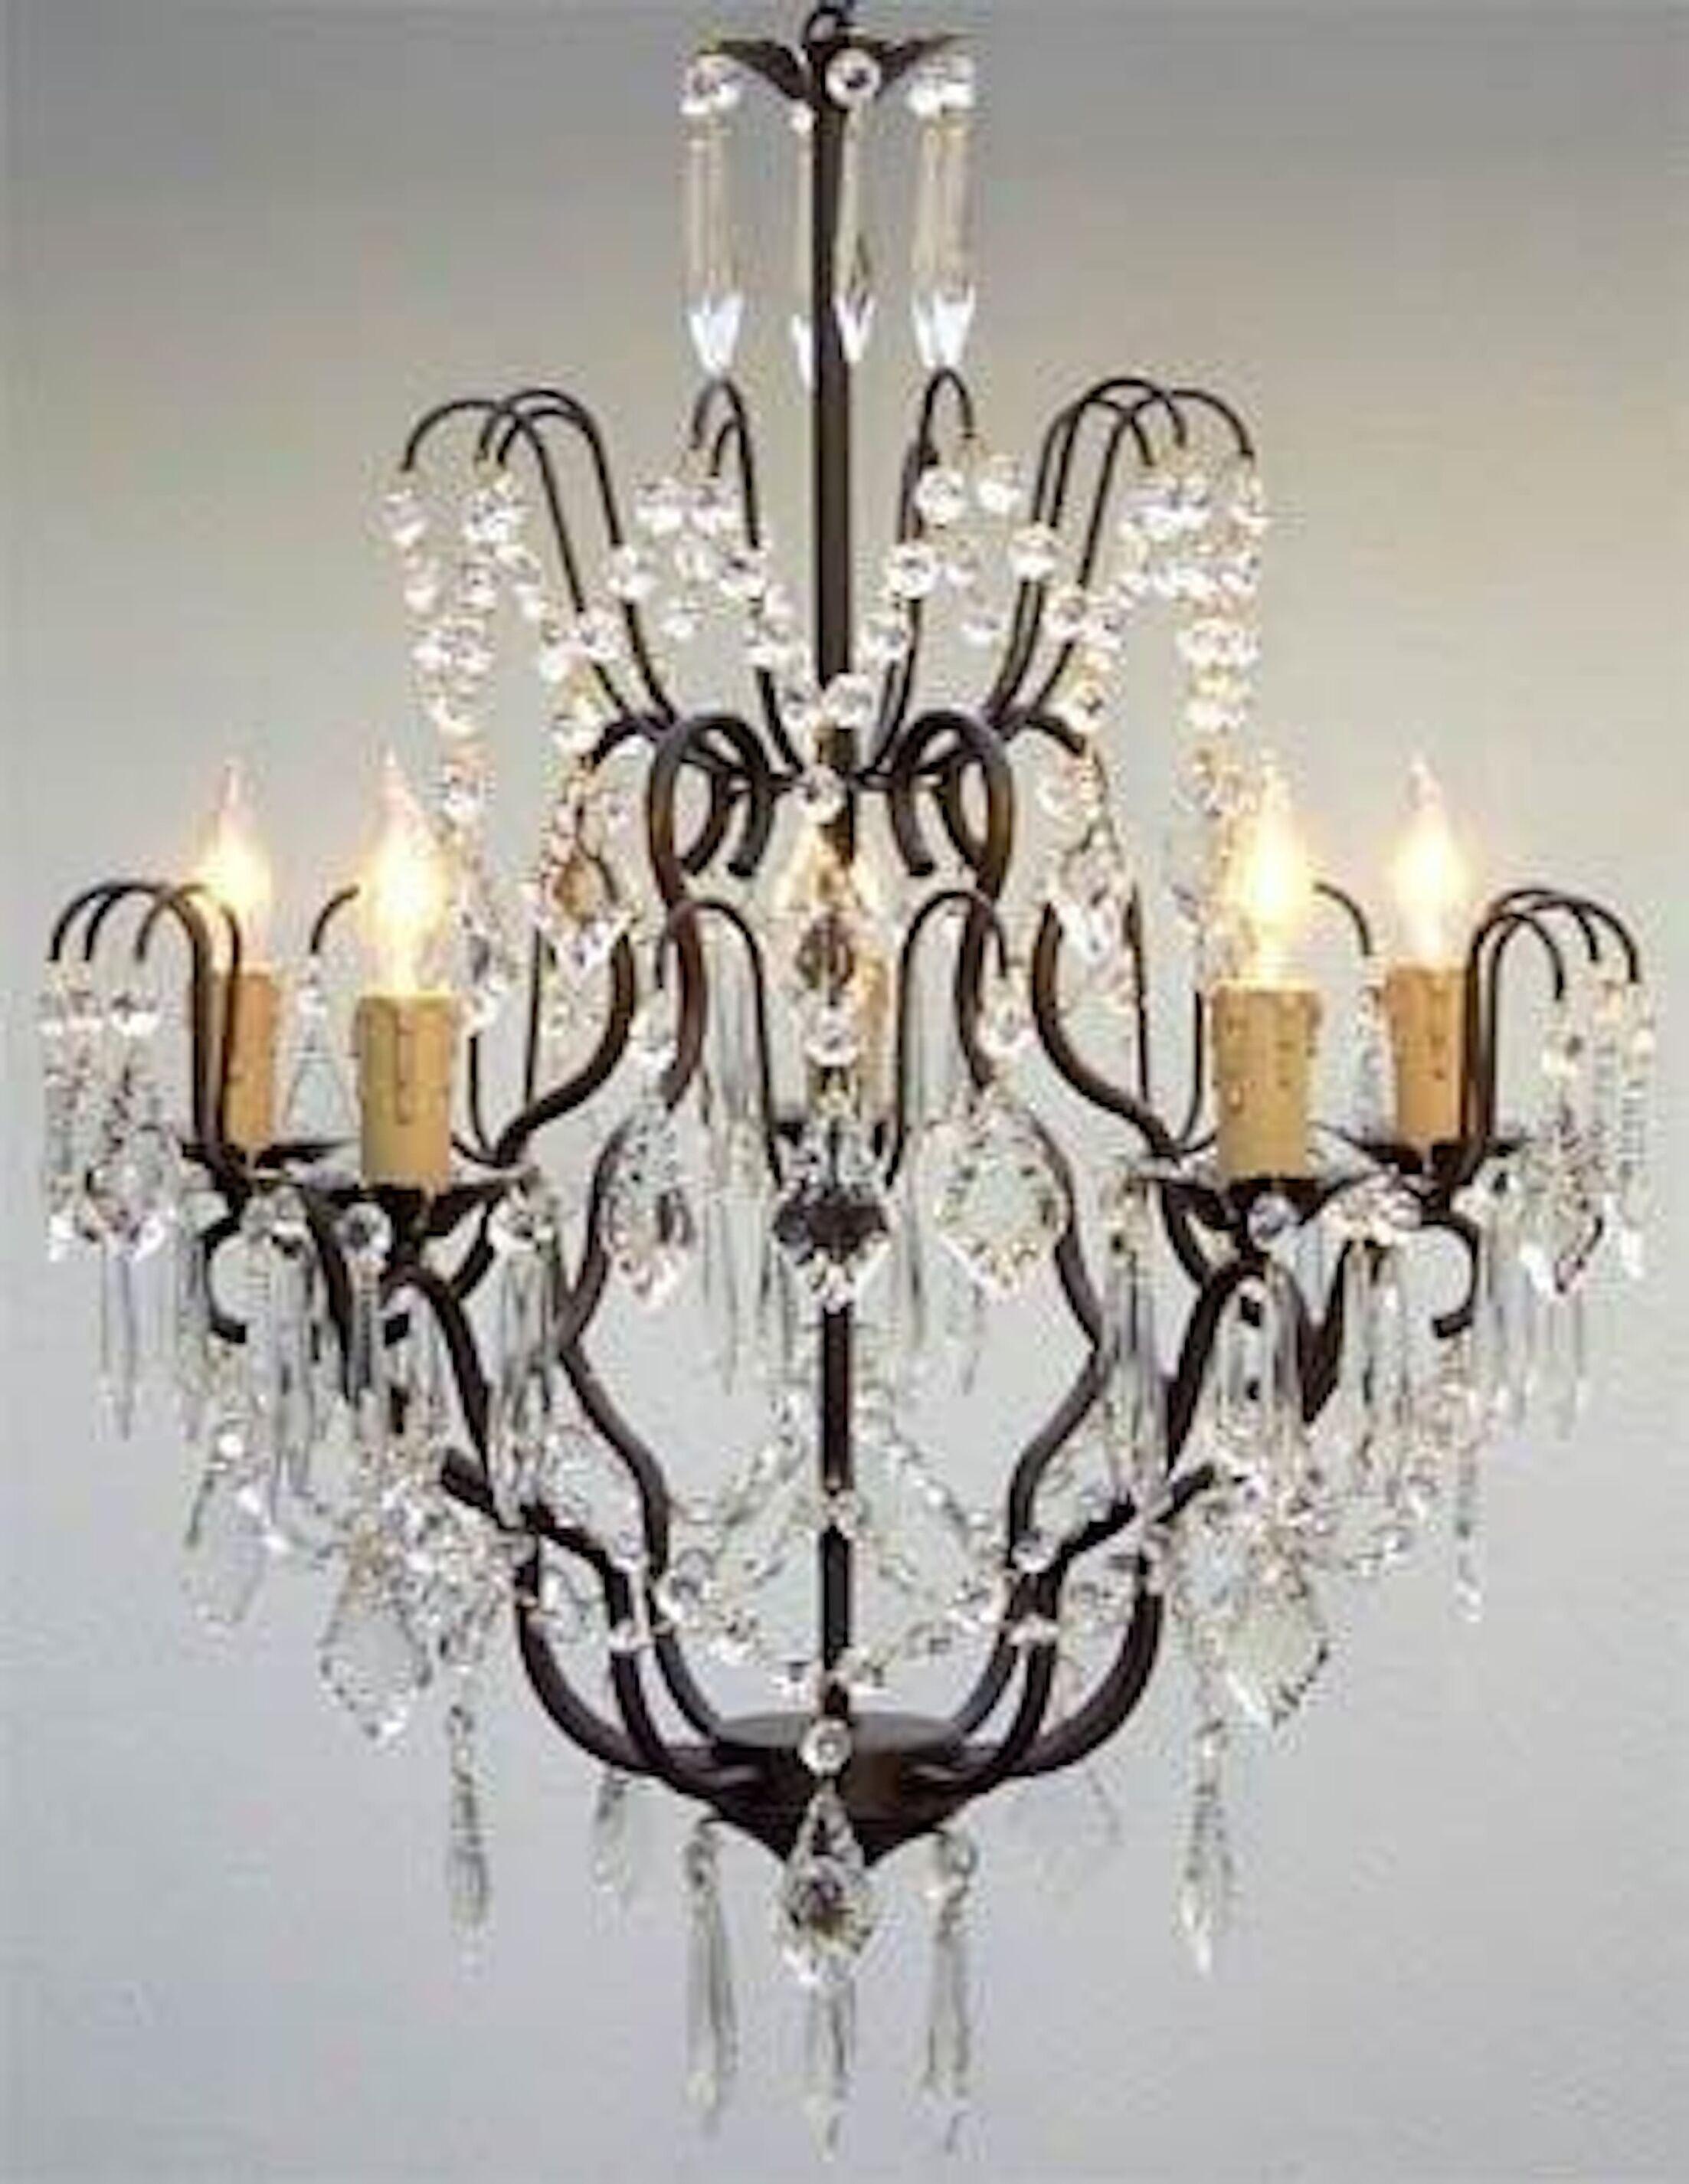 Alvan 5-Light Candle Style Chandelier